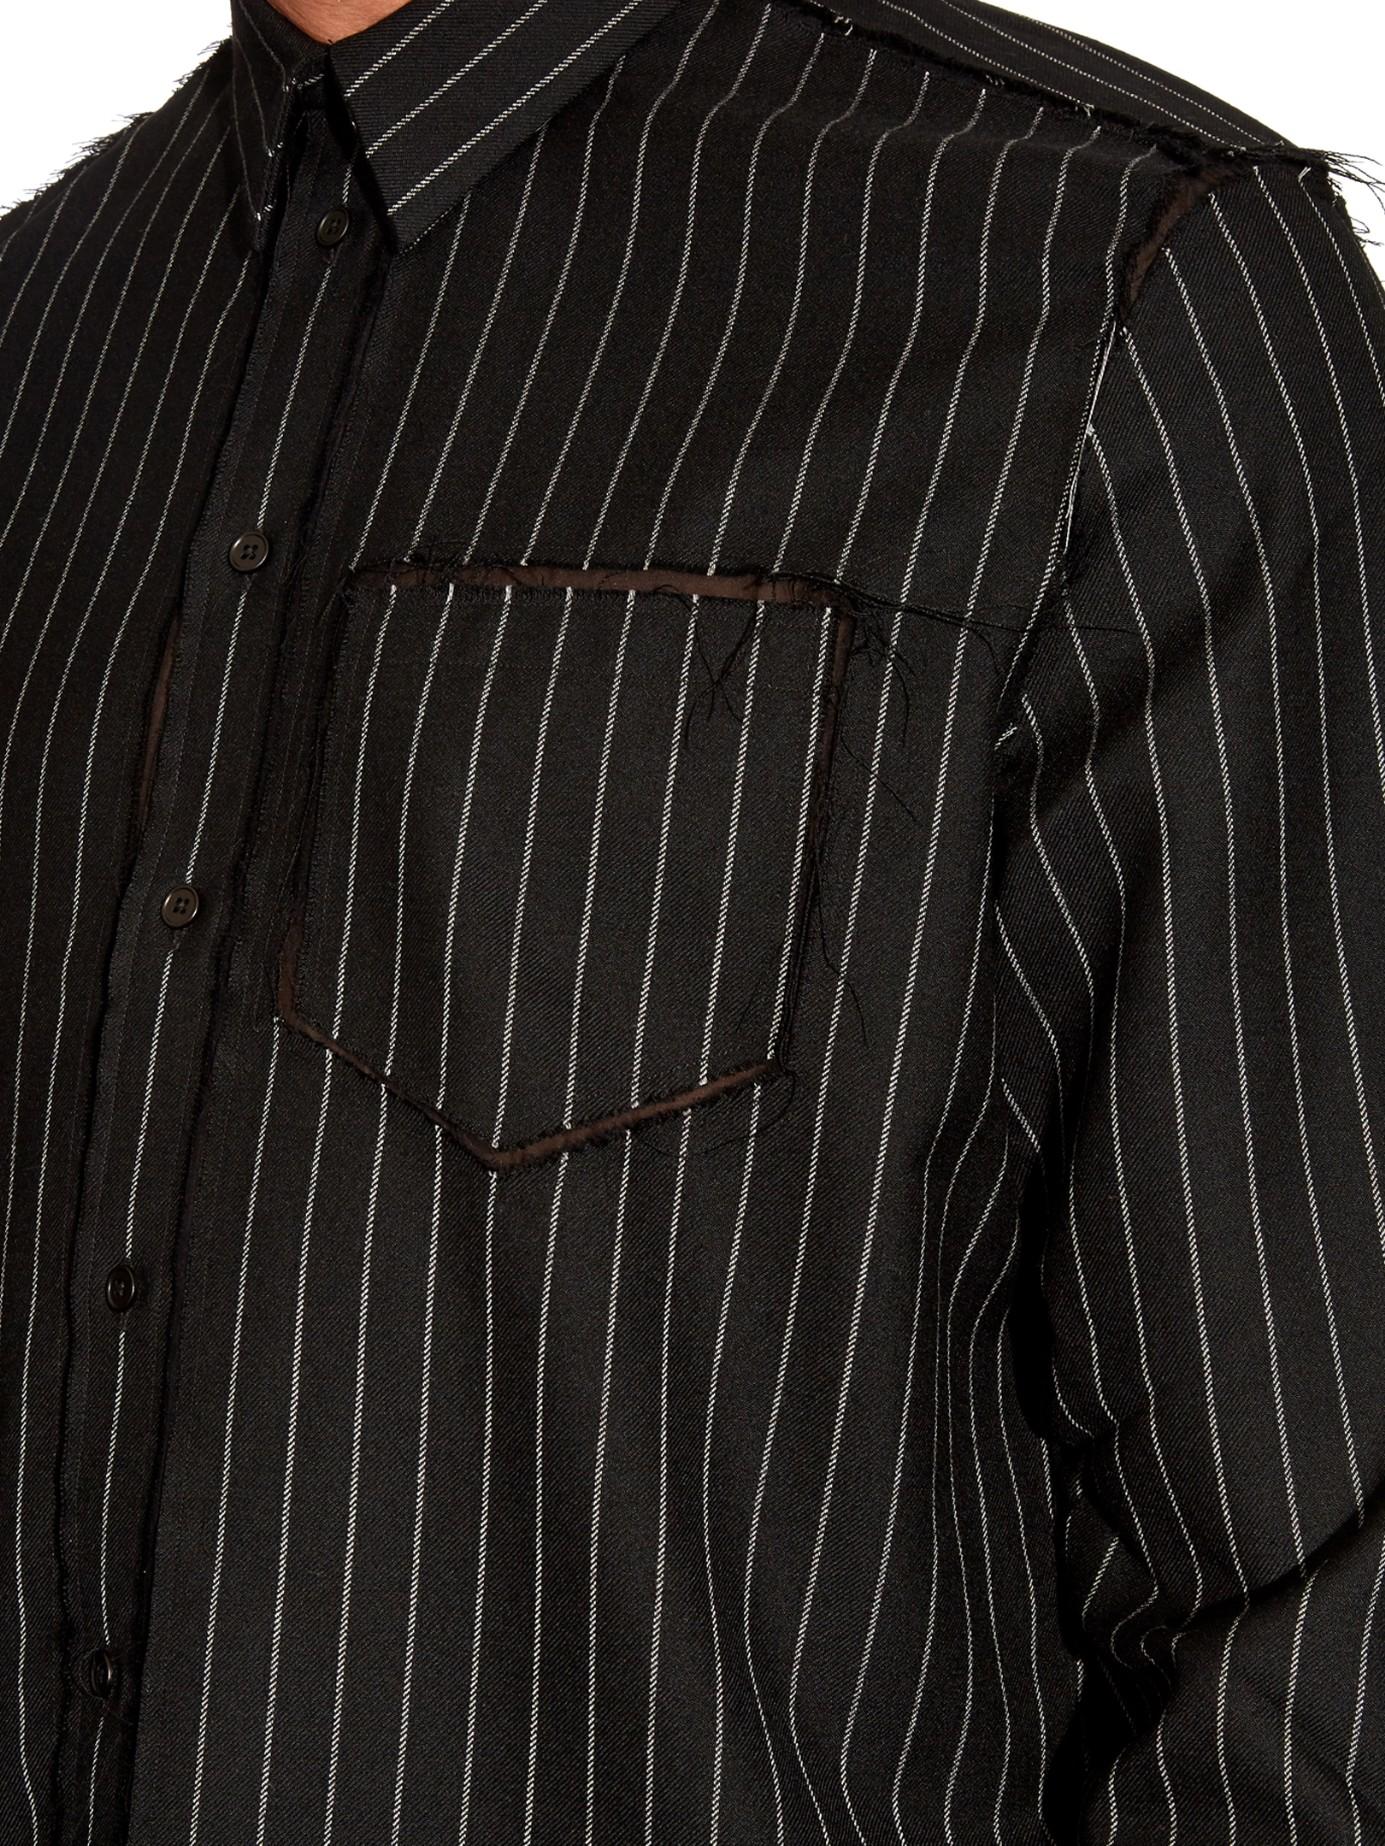 Mens black pinstripe dress shirt